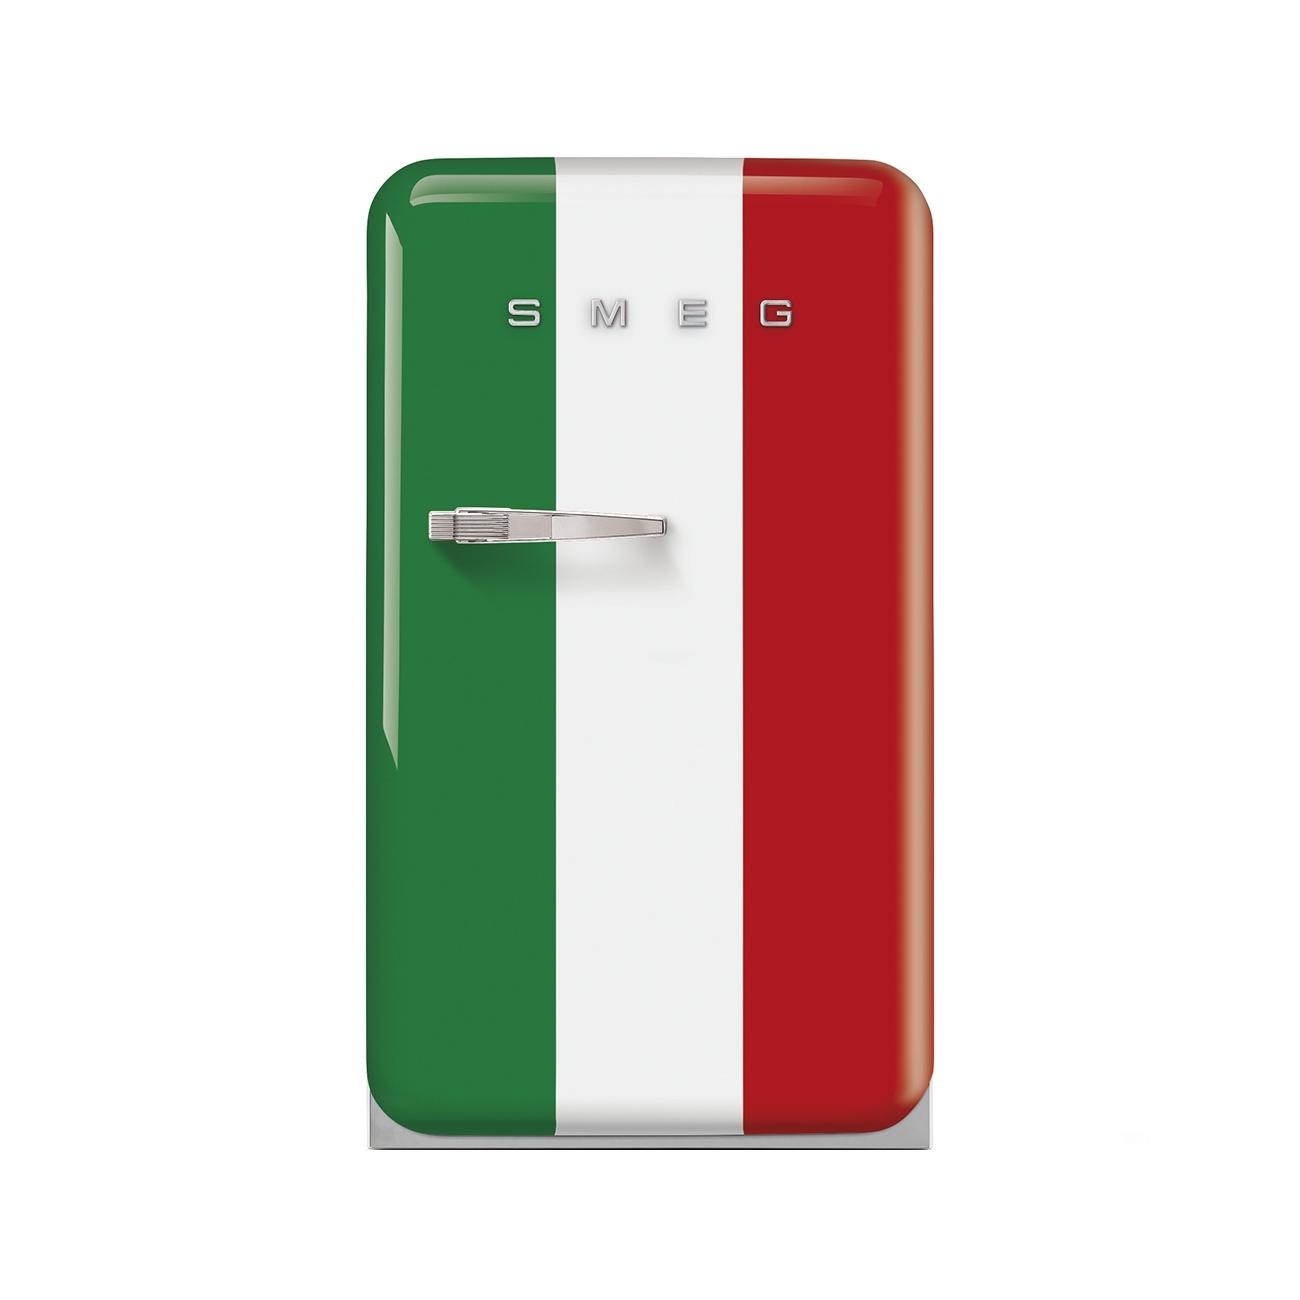 3d Wallpaper Pool Table Smeg Fridge Italian Flag 50 S Retro Style Tattahome